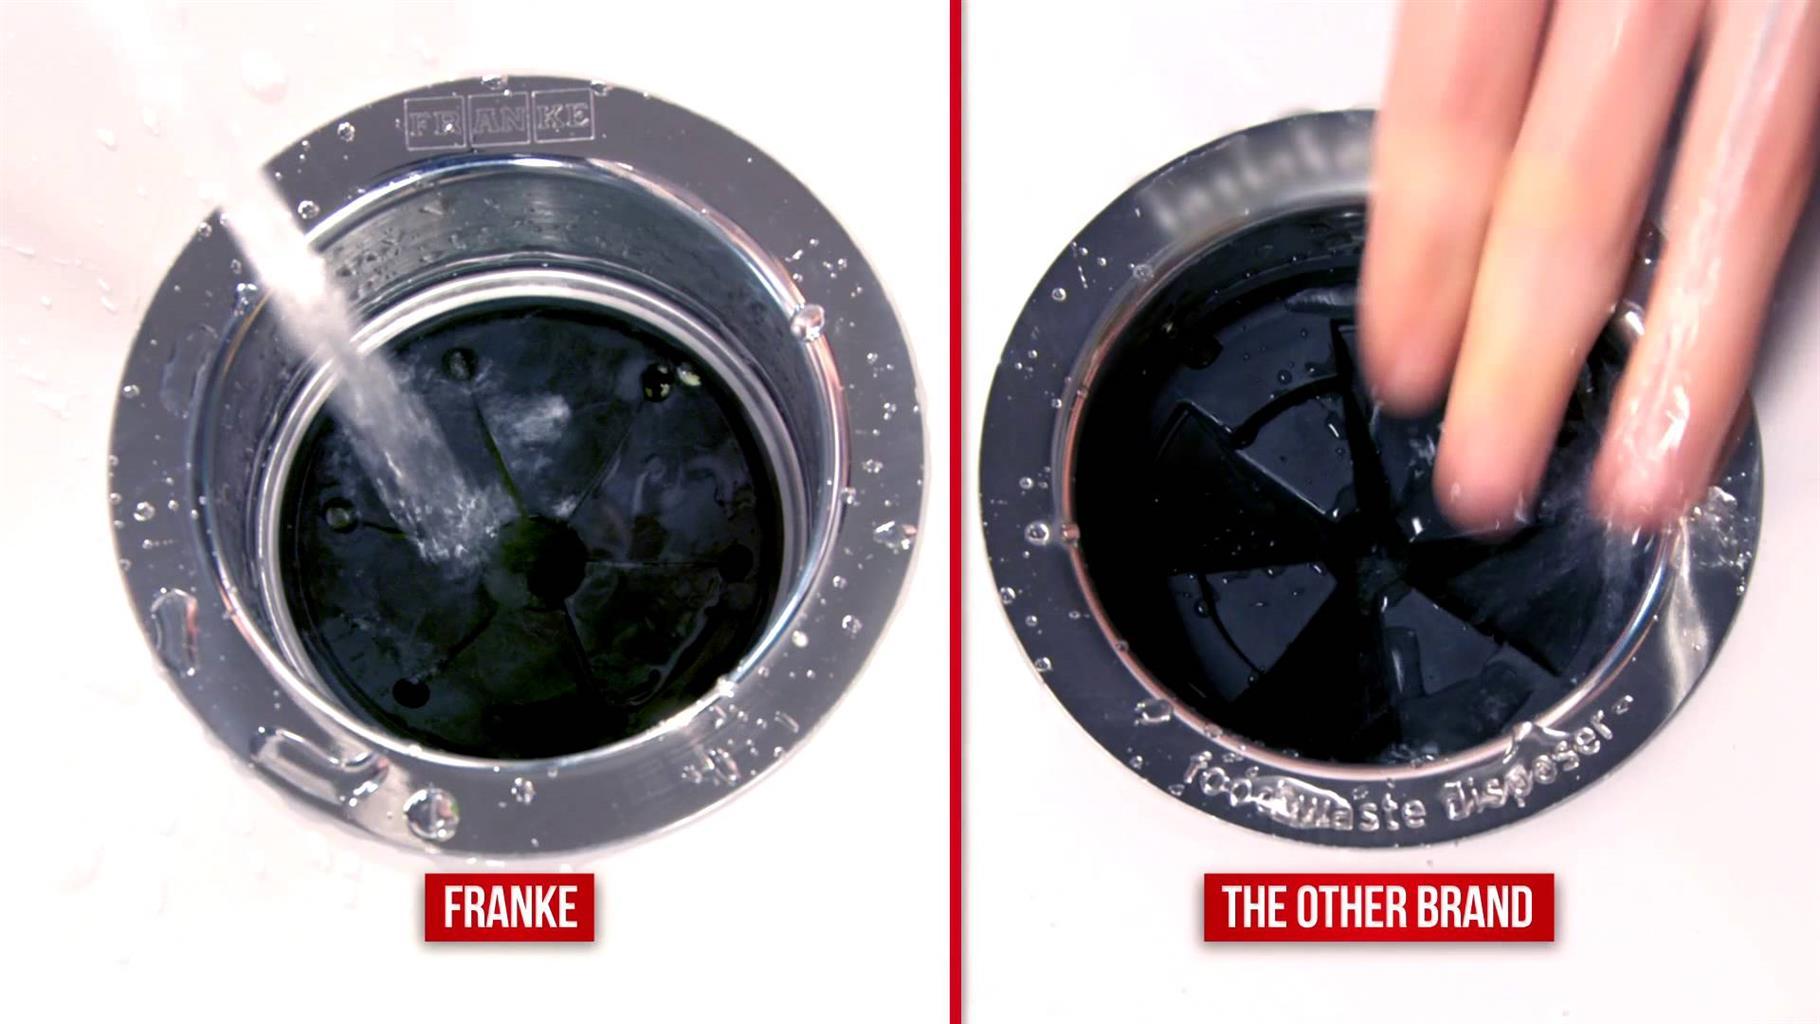 Franke Waste Disposal Unit 3.5 HP